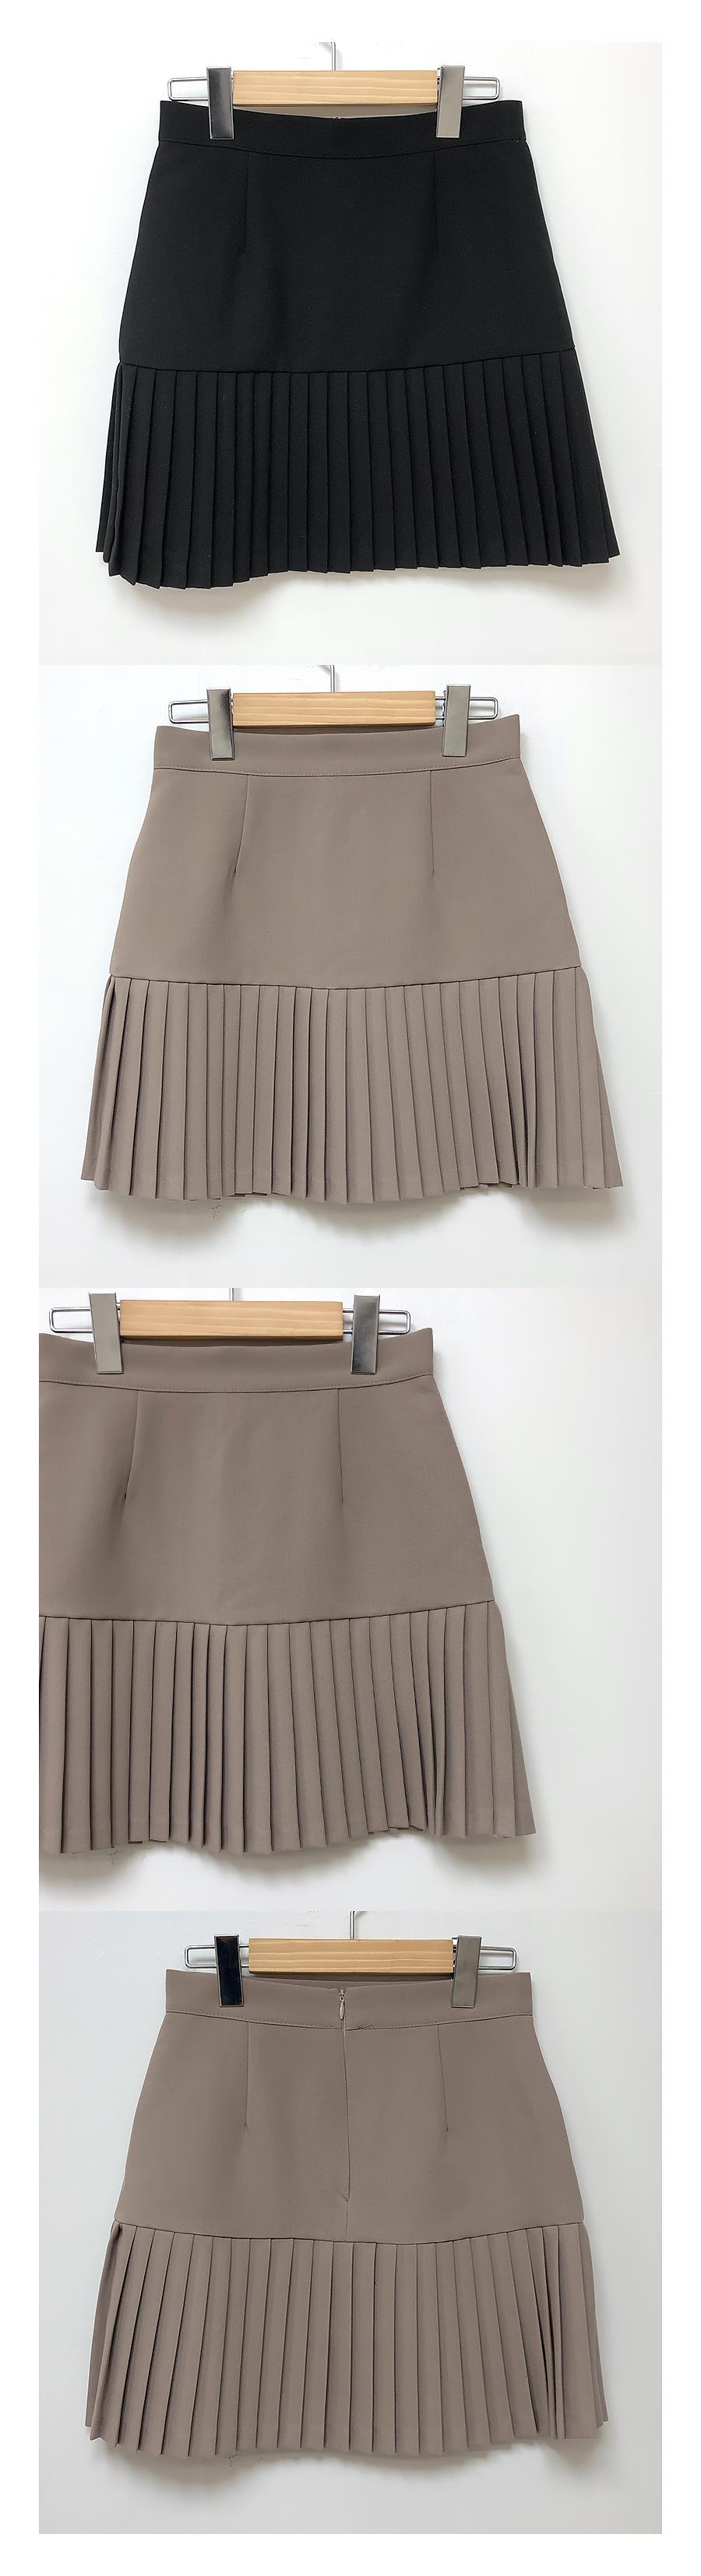 Charming pleated skirt